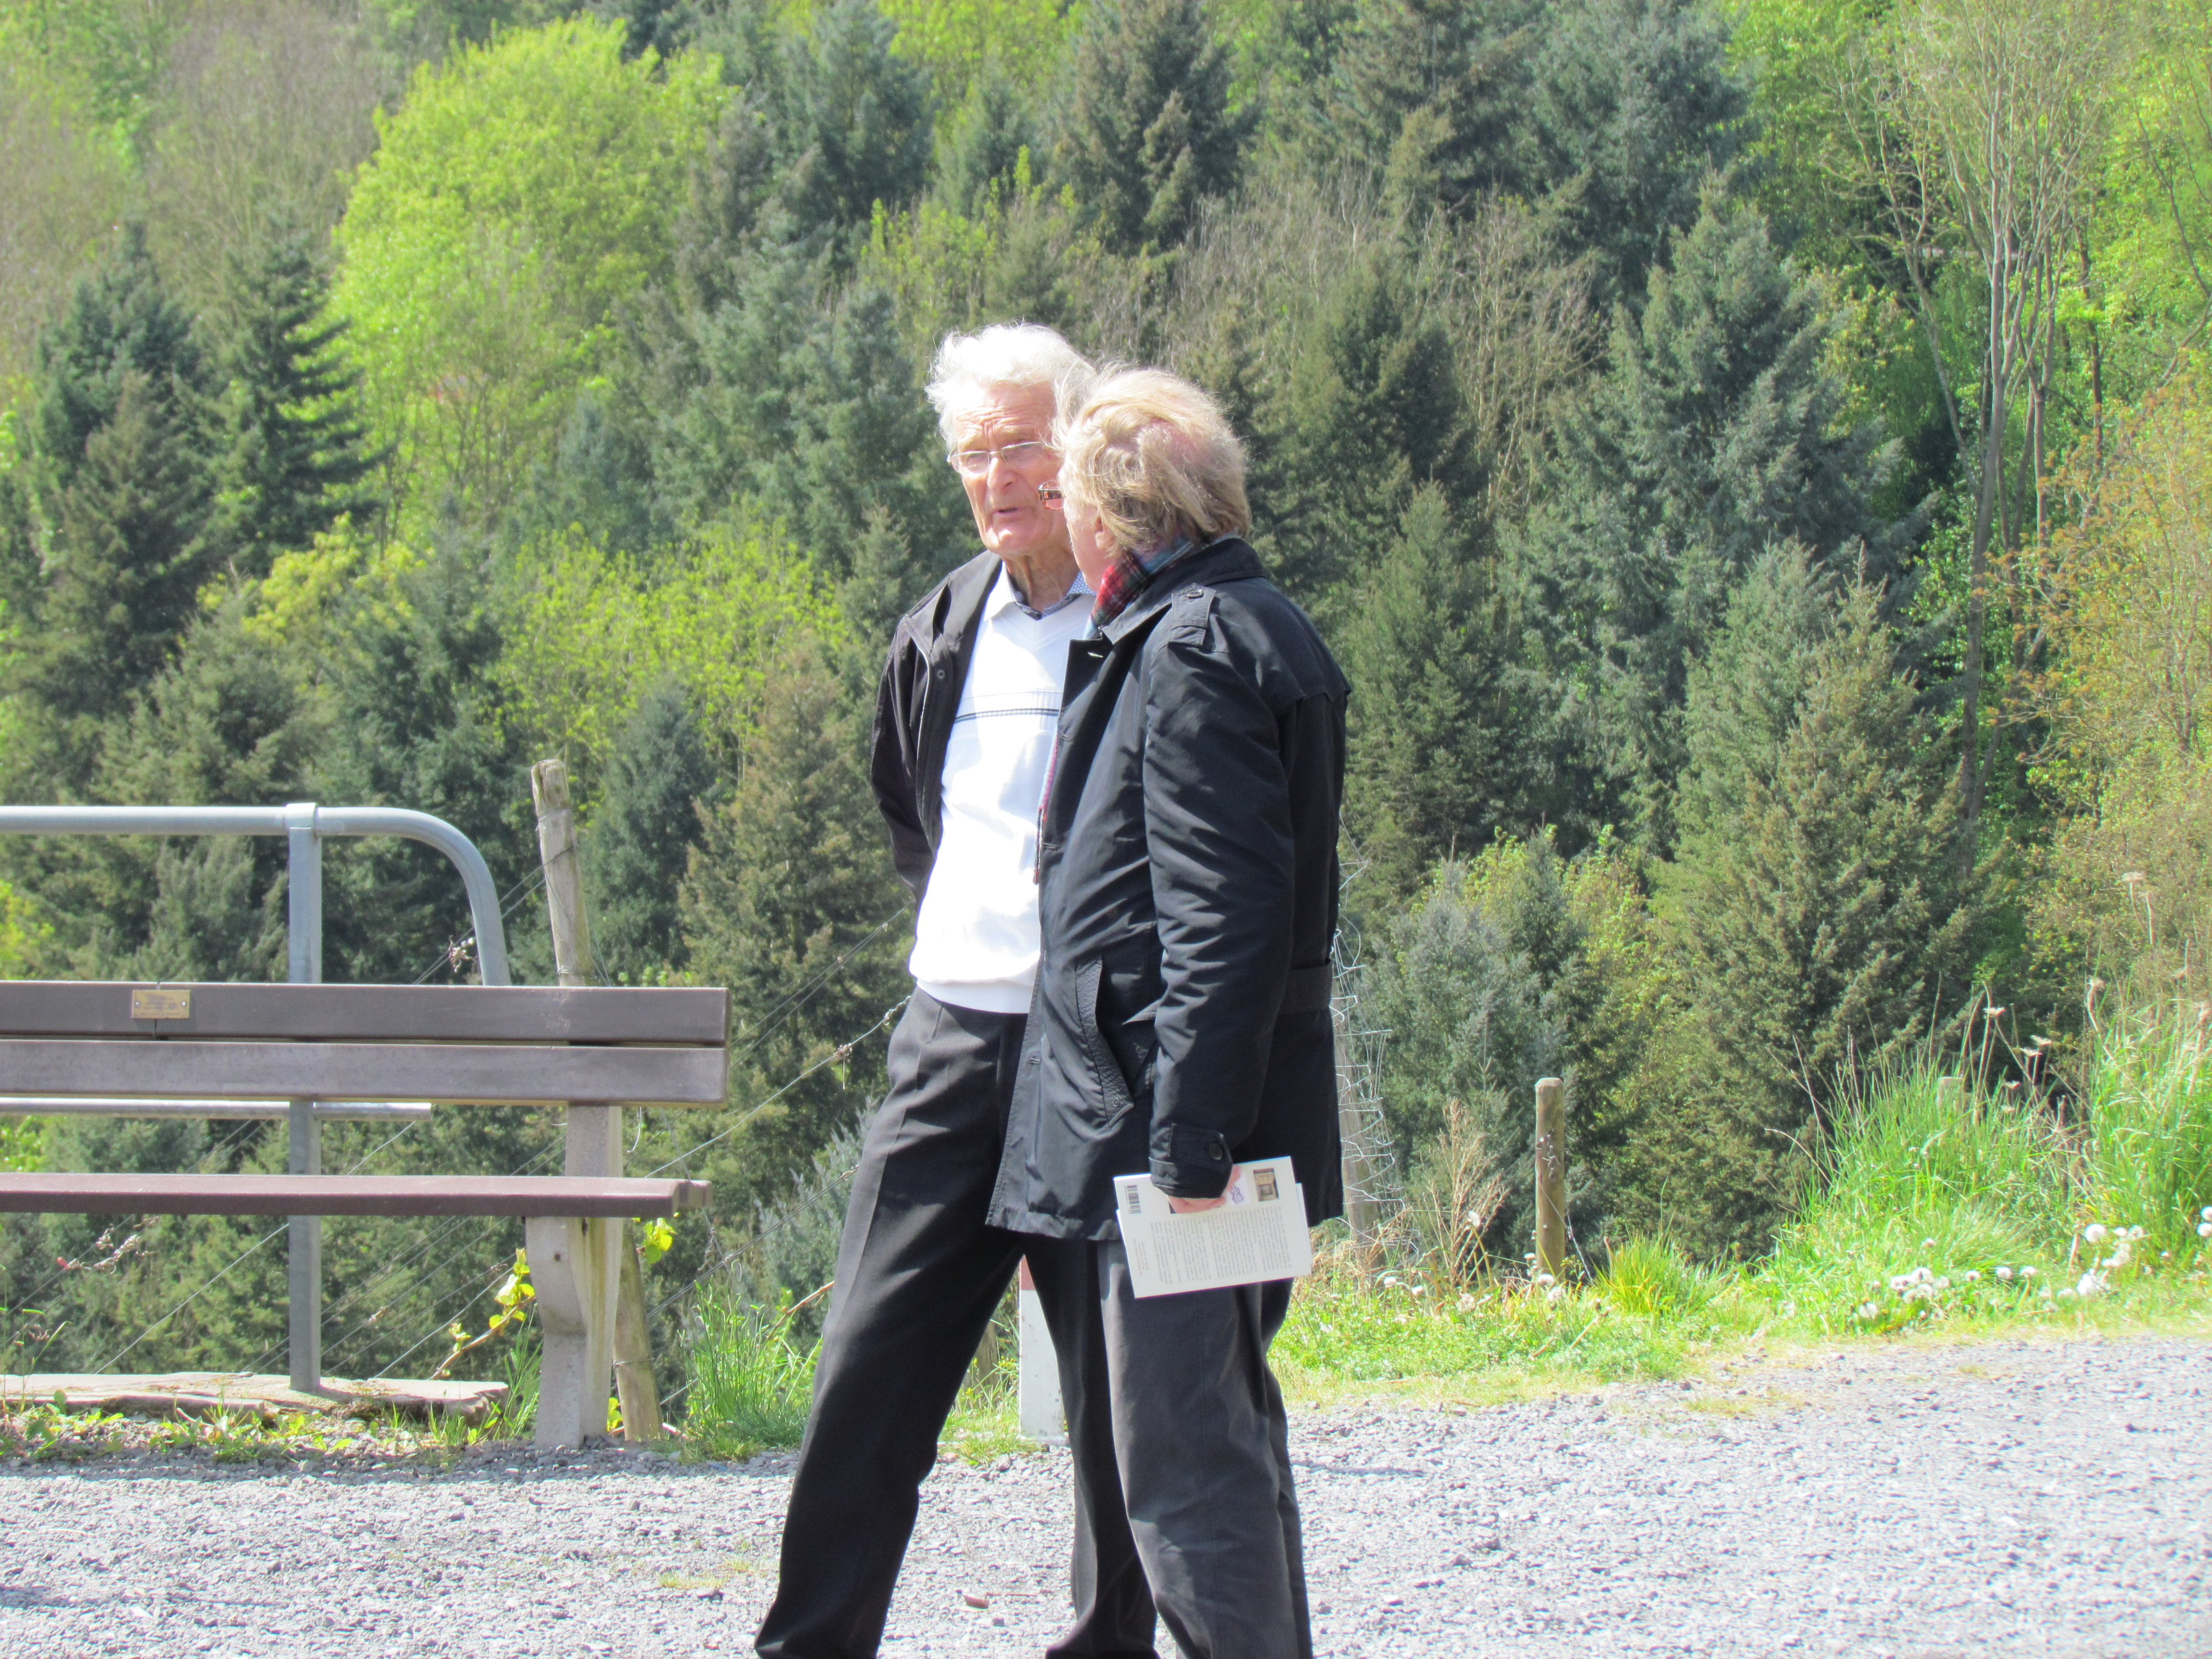 2017-05-Mai-06-Chorausflug-Ahrweiler_Bernd-Finken_028